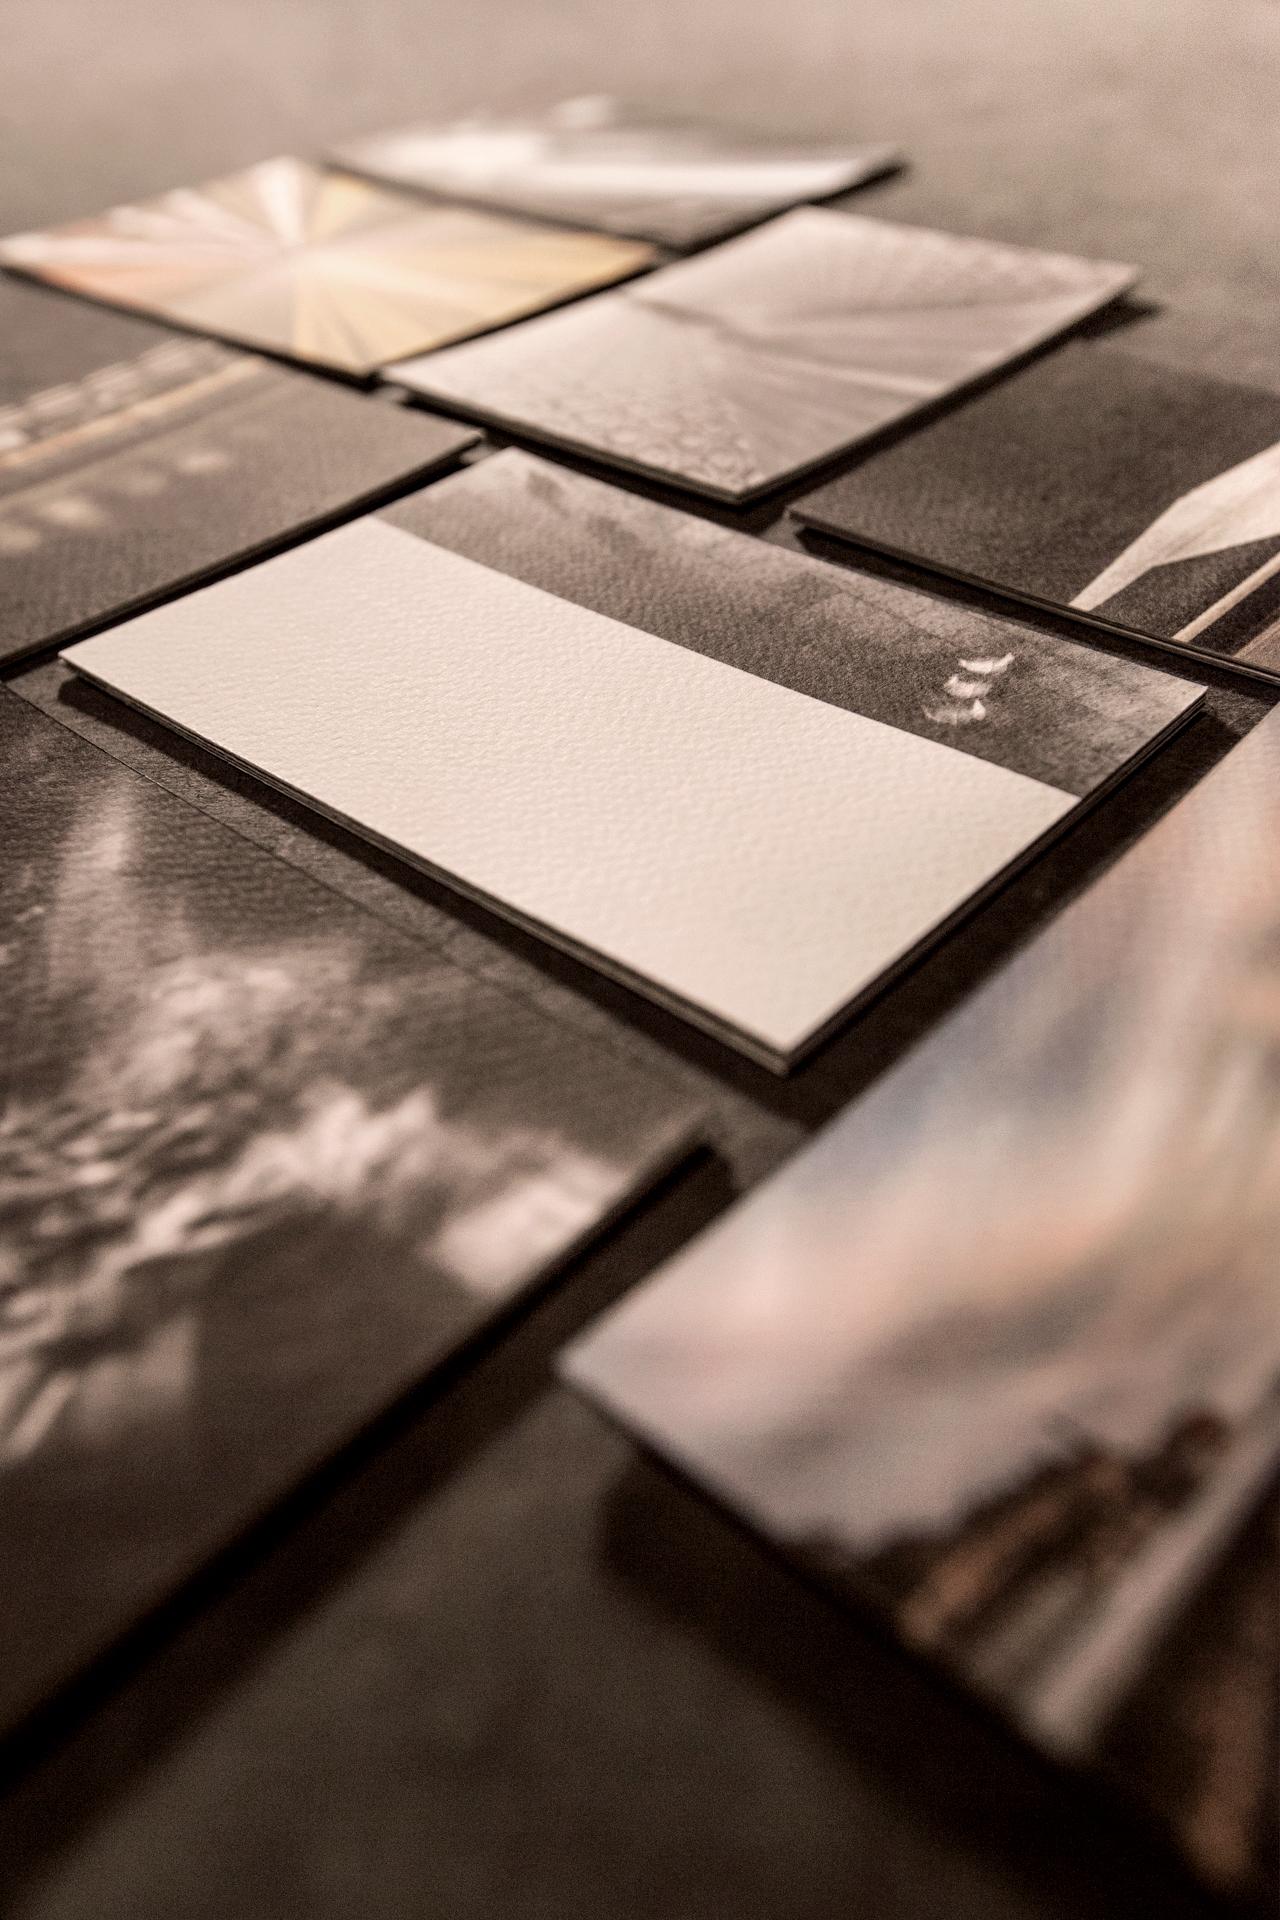 In Transit bonjourmolotov André Gigante Experimenta Design 2015 EXD15 Photography Exhibition Exposição Fotografia Cooperativa Árvore 14 N.jpg